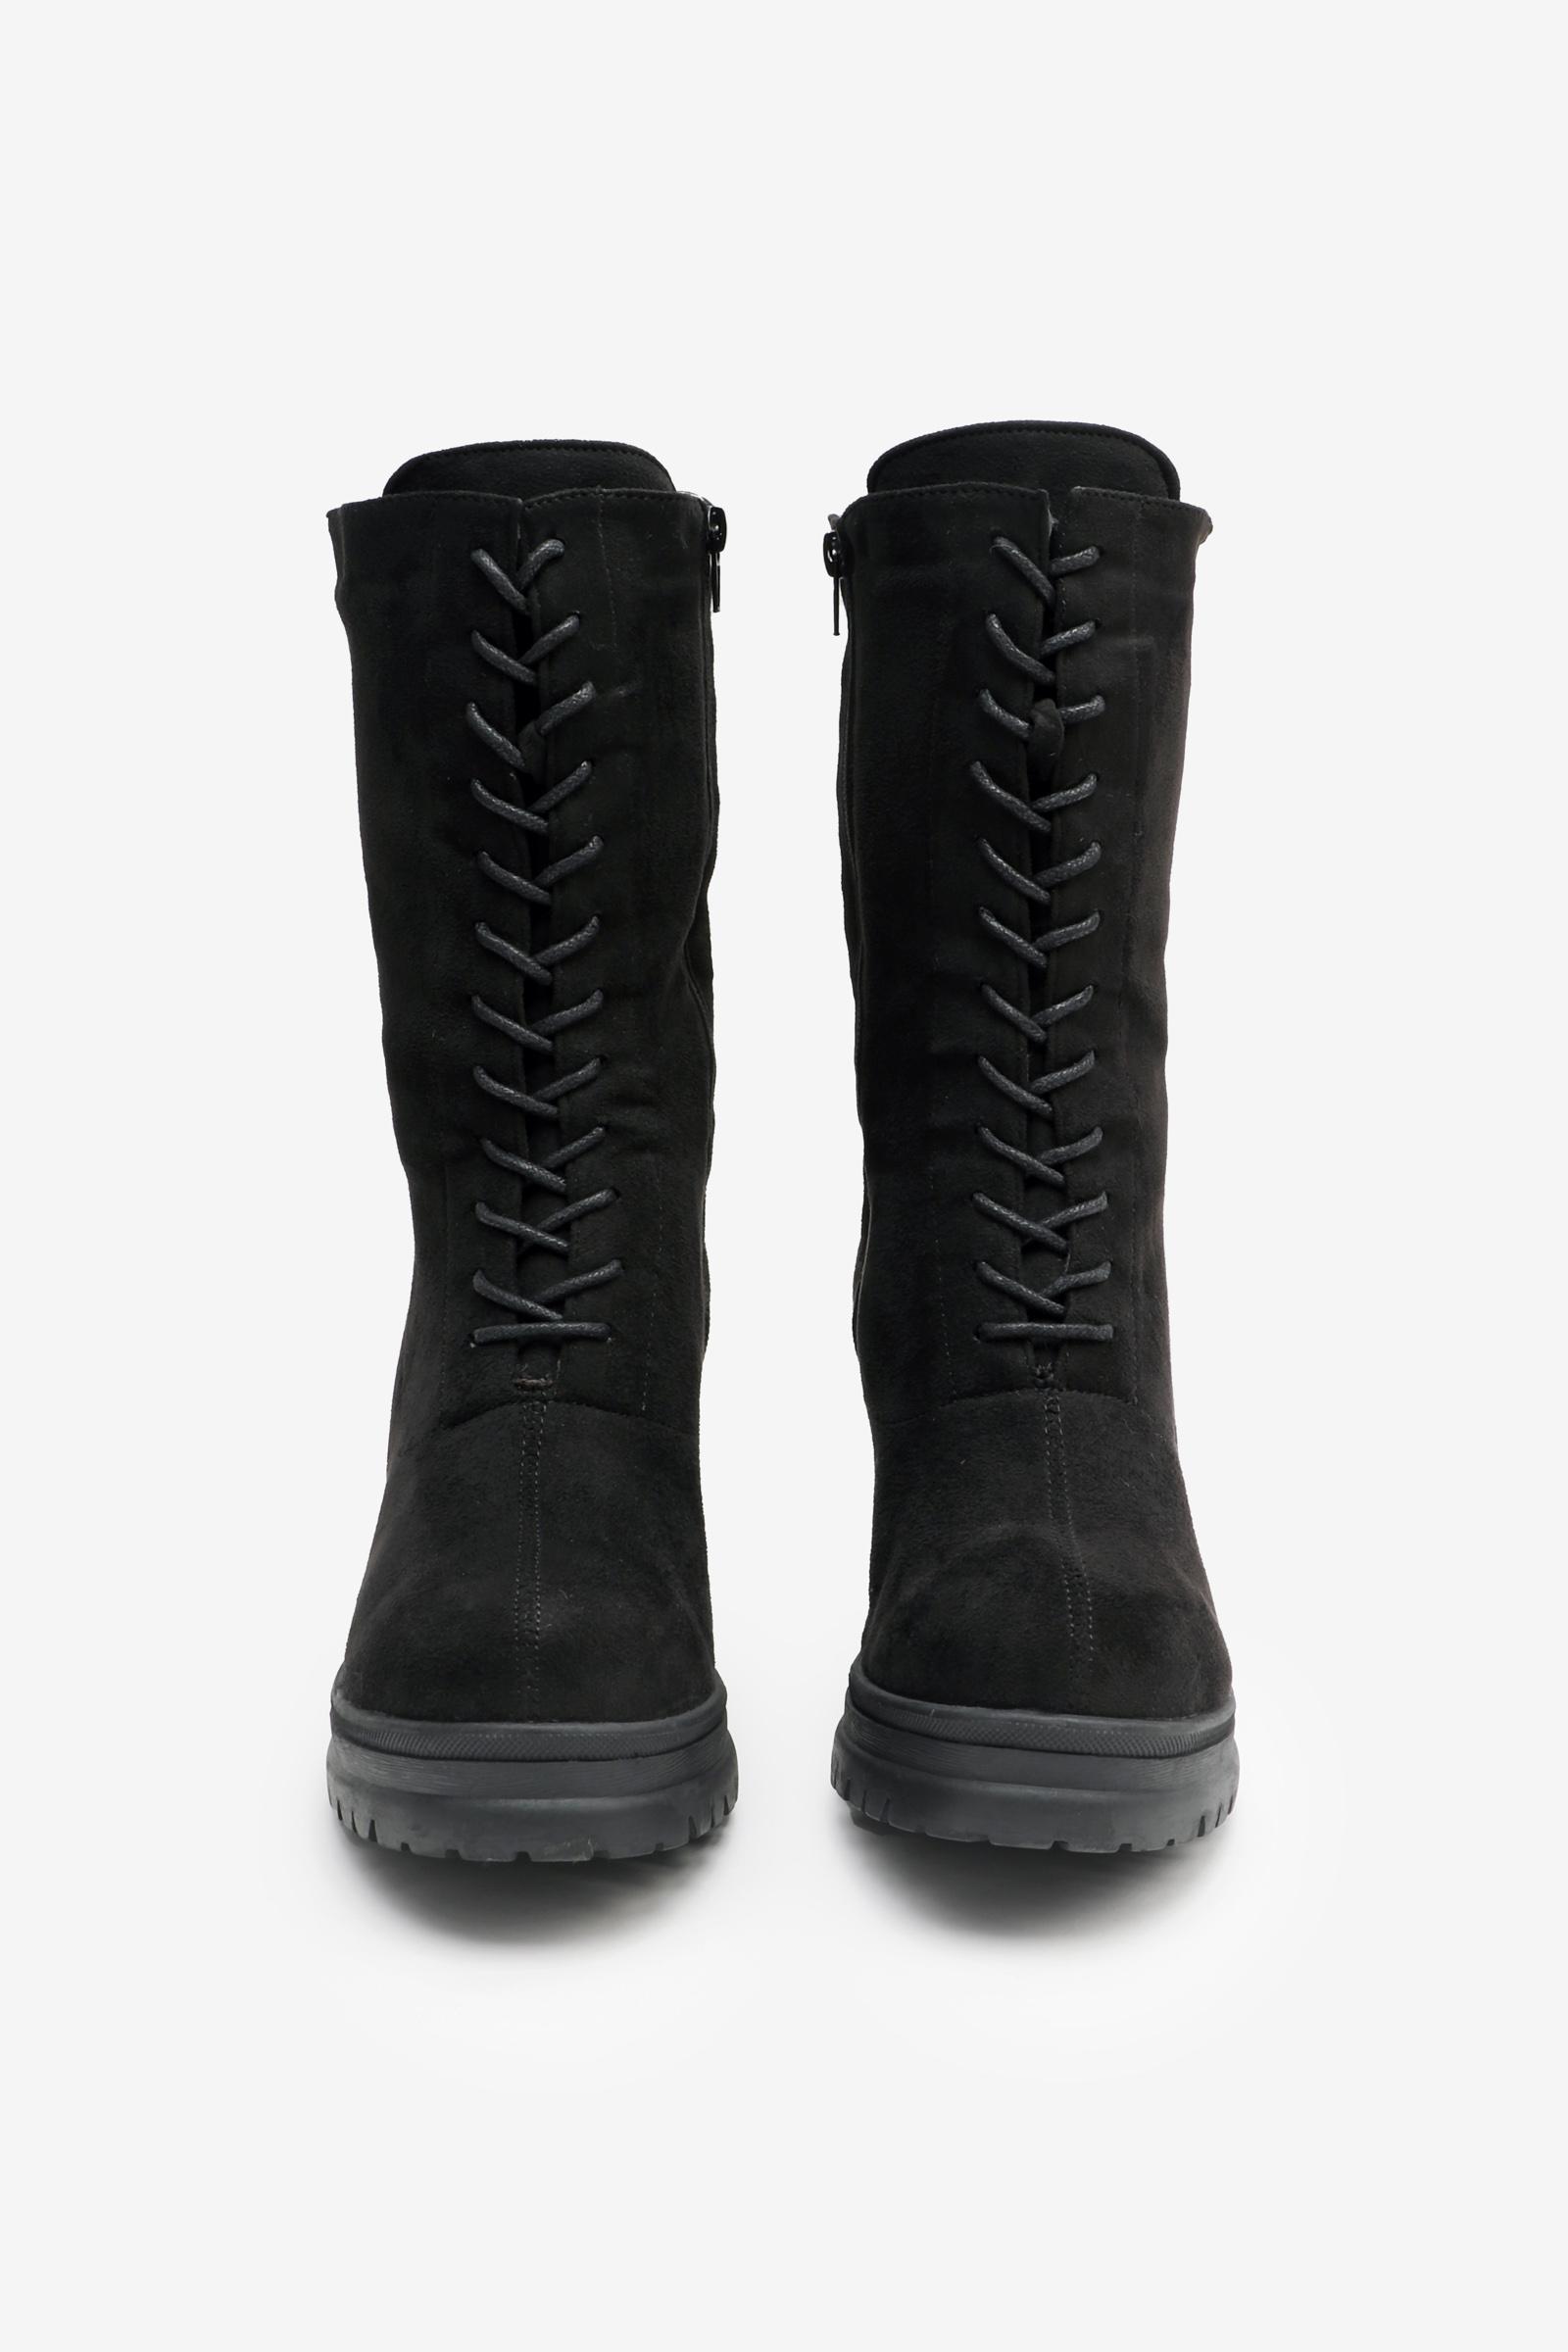 Track Heel Mid-Calf Boots